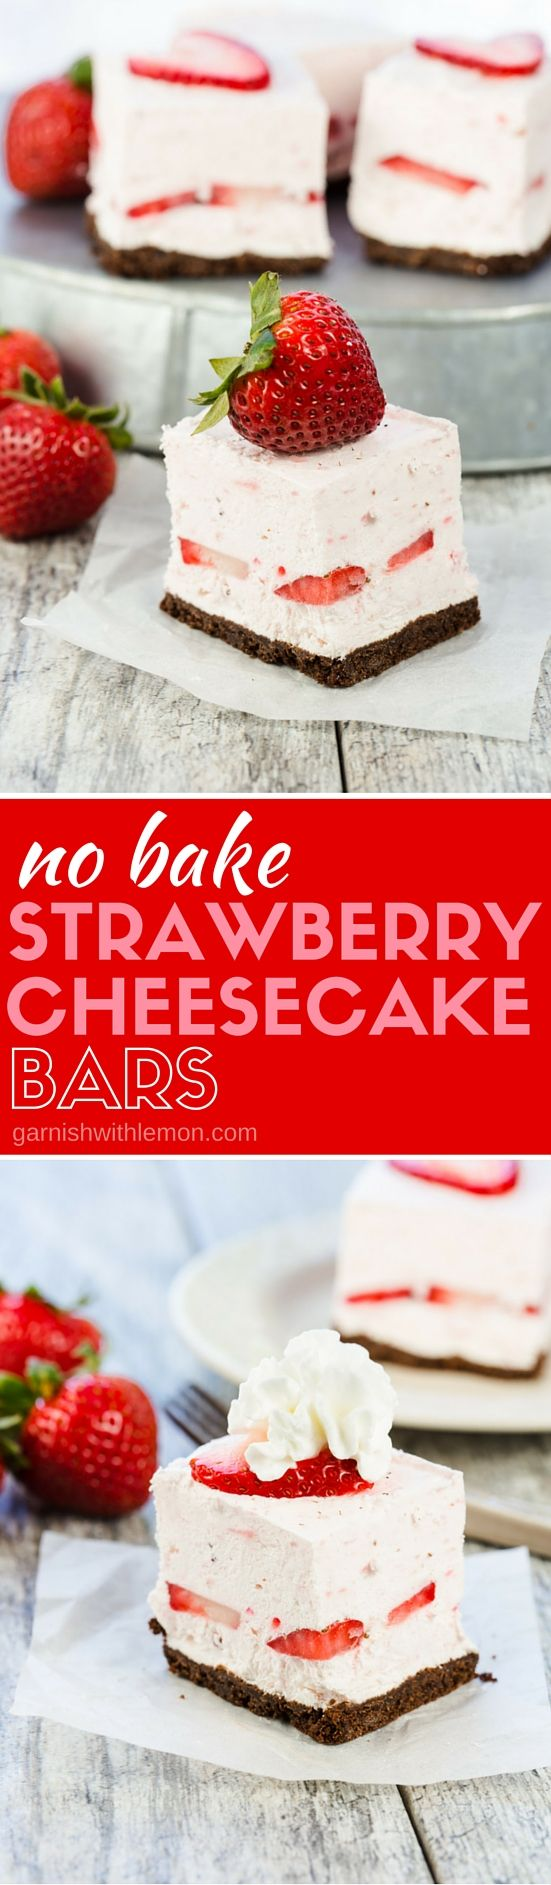 ... cheesecakes mini cheesecakes i mini cheesecakes iii mini mini nutella